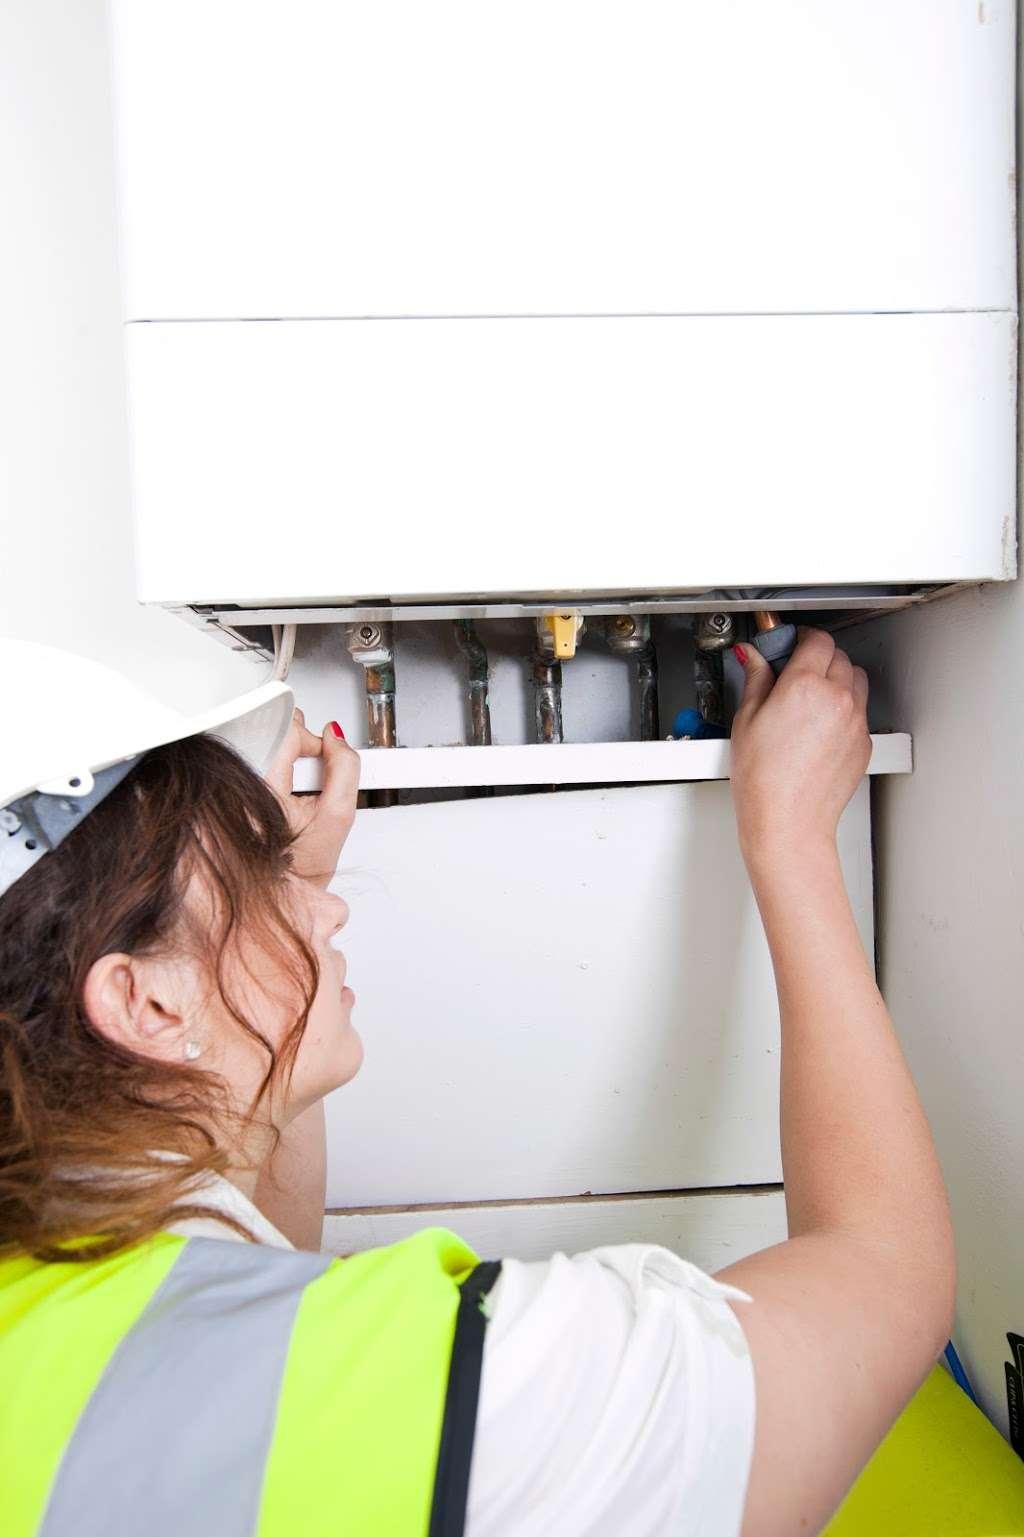 KKD Enterprises Inc - plumber  | Photo 6 of 8 | Address: 3300 Shafto Rd, Tinton Falls, NJ 07753, USA | Phone: (732) 671-0175